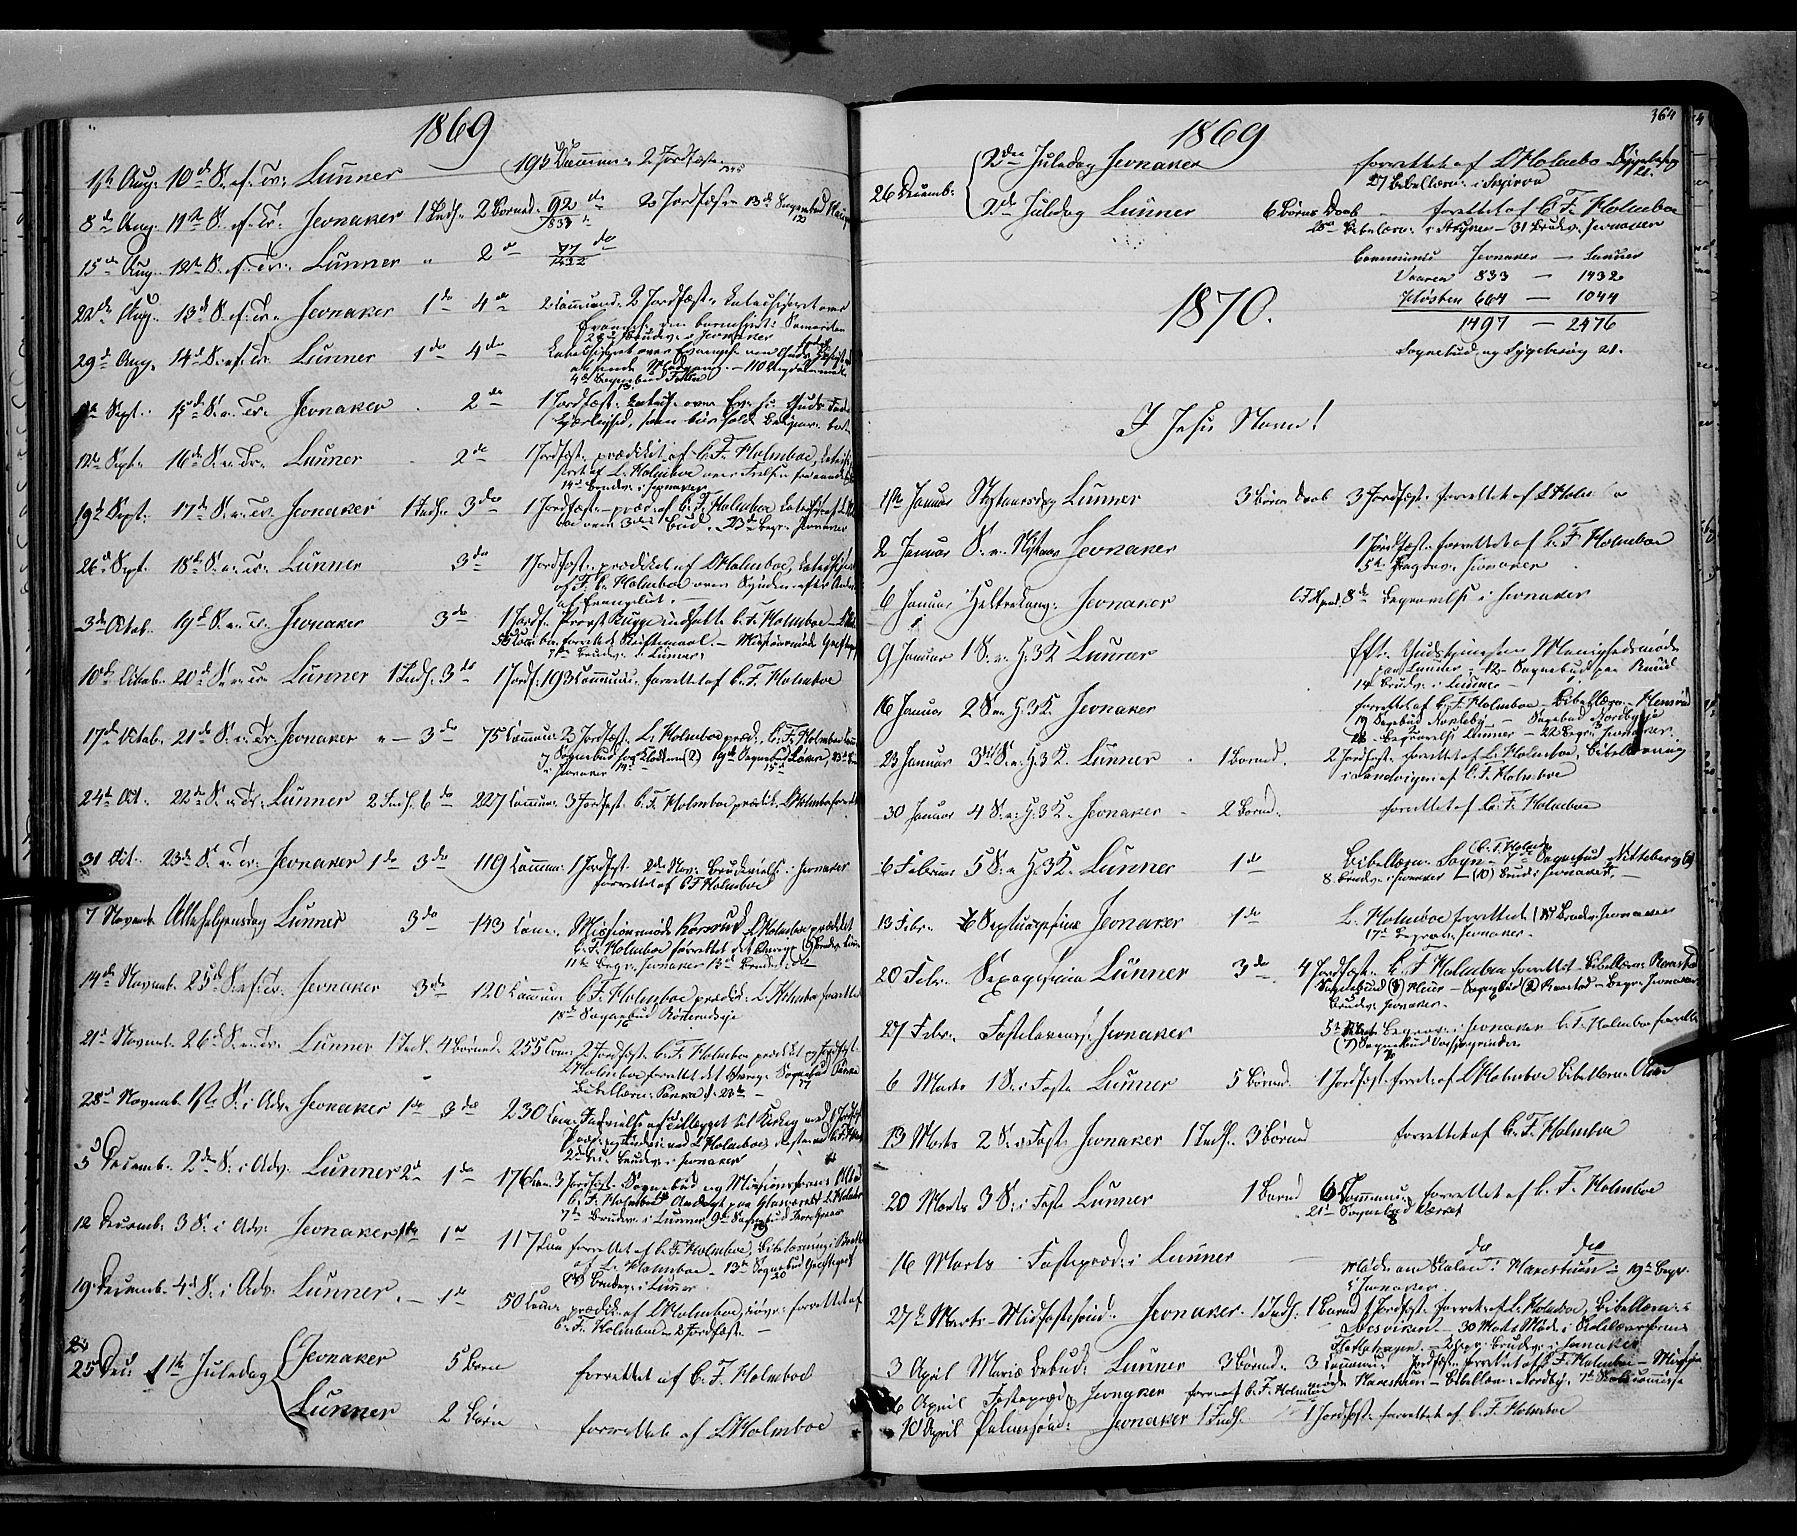 SAH, Jevnaker prestekontor, Ministerialbok nr. 7, 1858-1876, s. 364